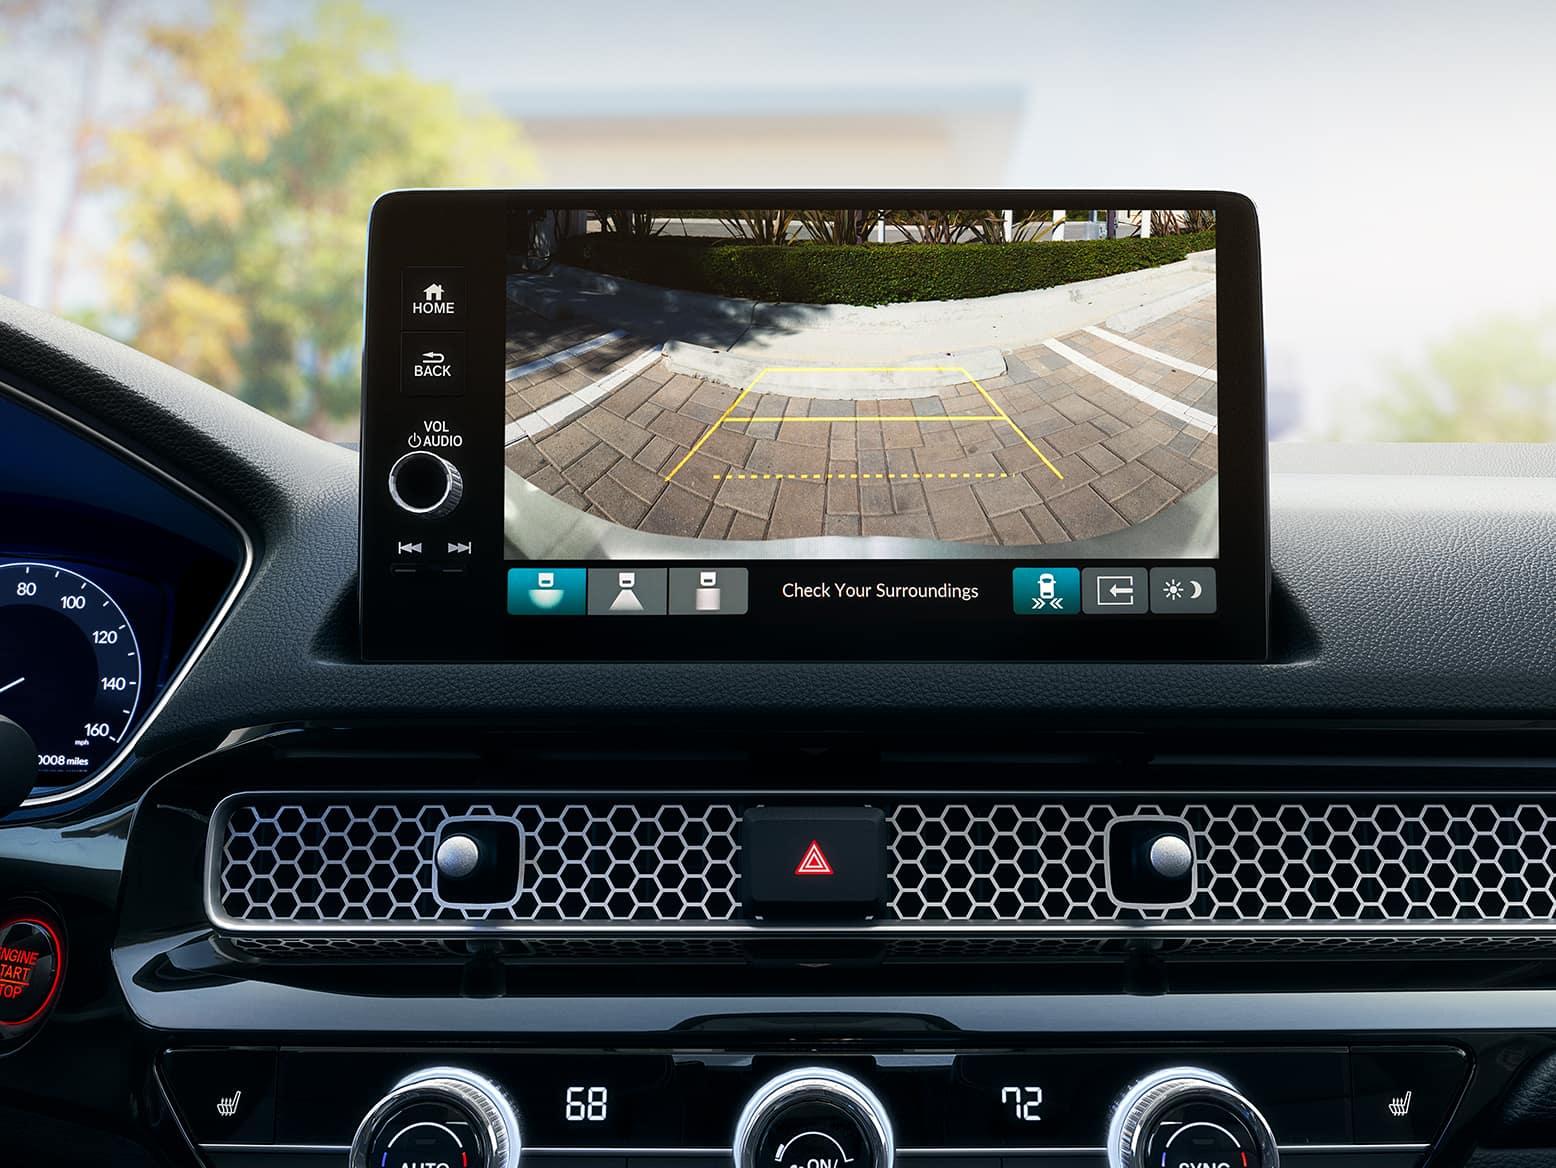 2022 Honda Civic with multi angle rear view backup camera